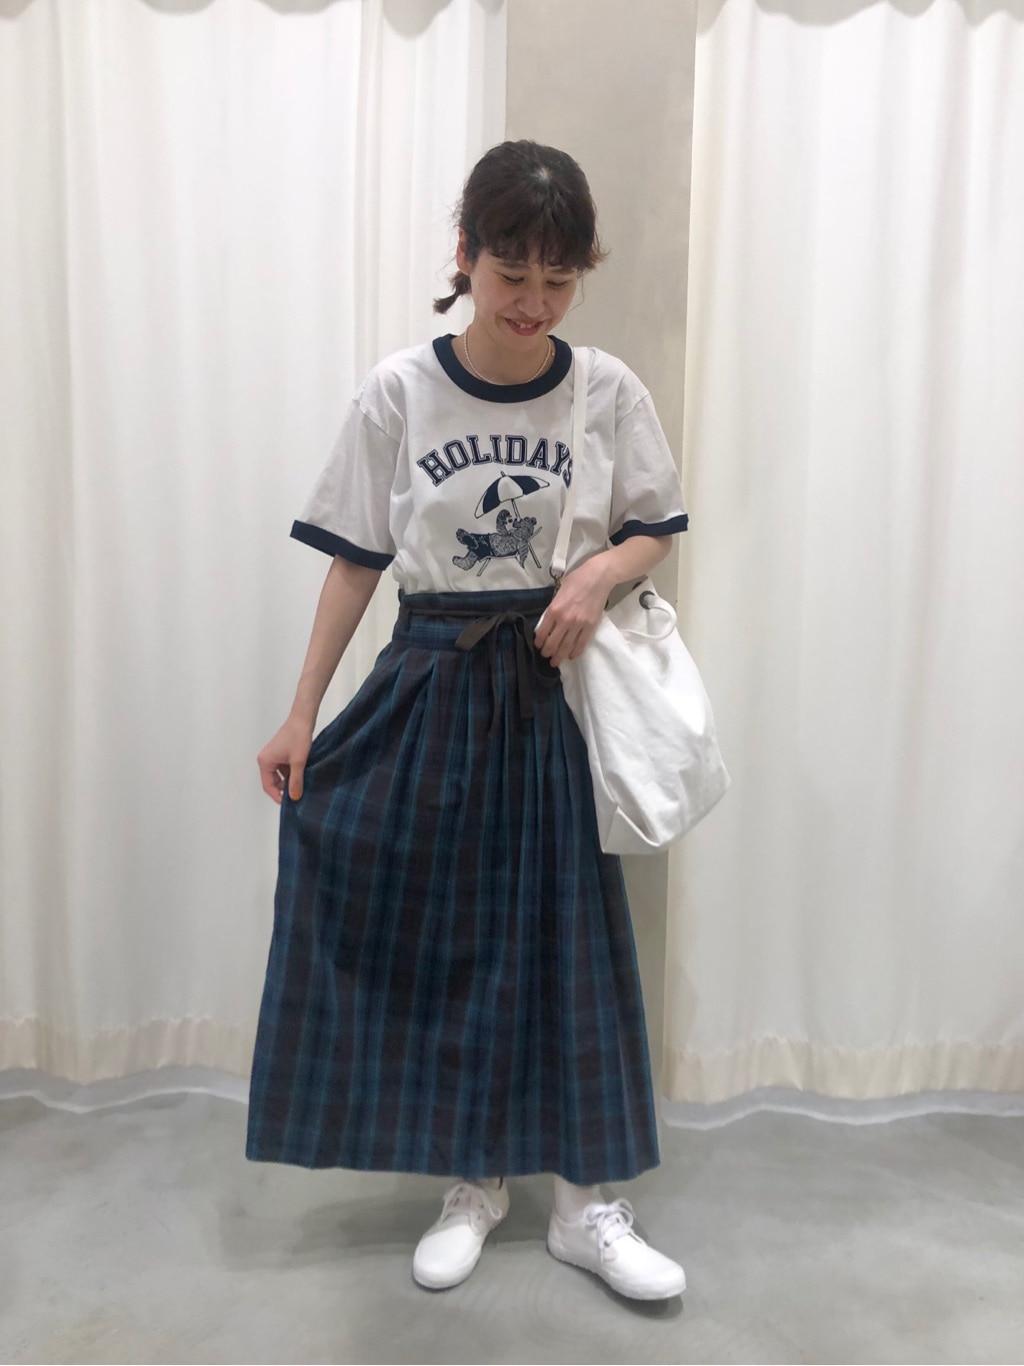 - CHILD WOMAN CHILD WOMAN , PAR ICI 東京スカイツリータウン・ソラマチ 身長:160cm 2021.06.09